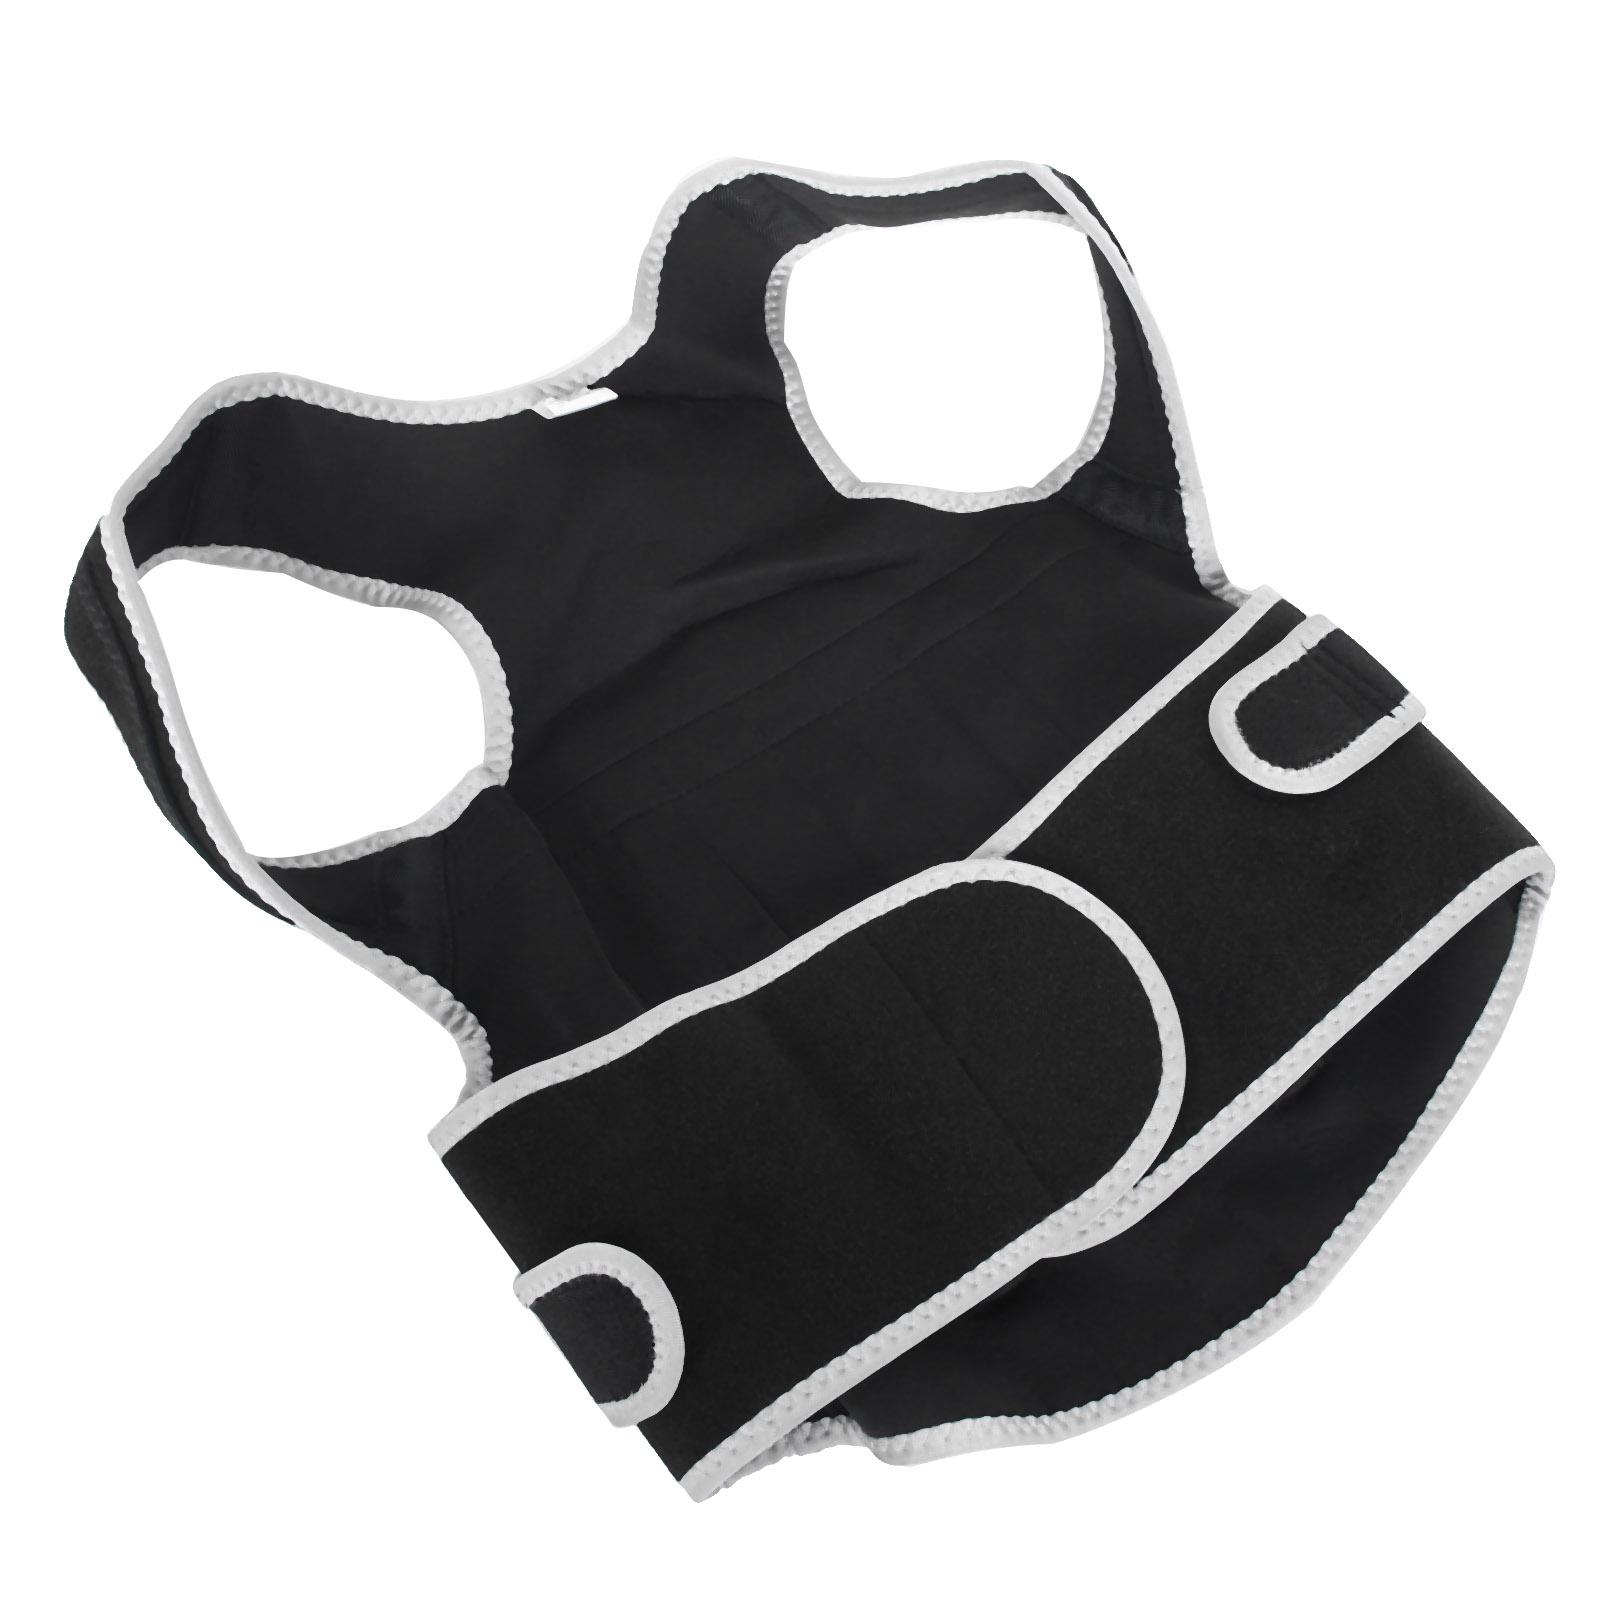 Posture-Corrector-Breathable-Back-Waist-Spine-Support-Belt-Brace-Straightener-GL thumbnail 24